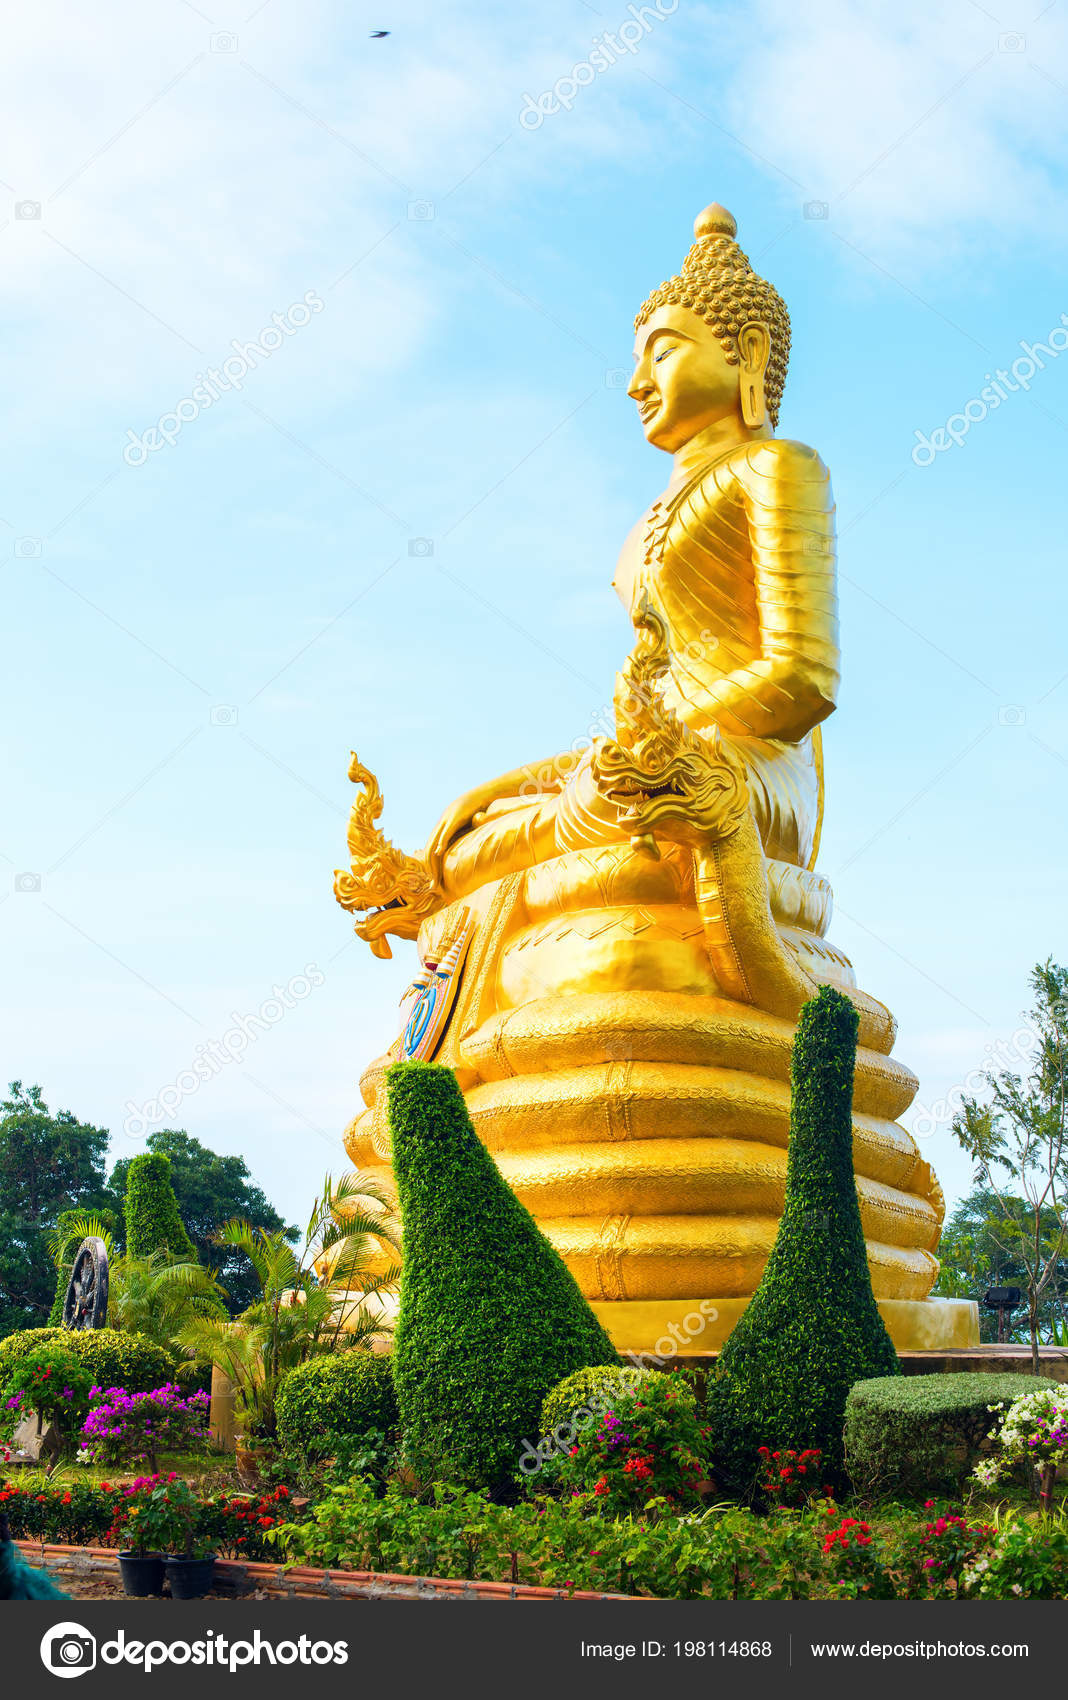 Statue Gold Buddha Big Buddha High Hilltop Phuket Thailand Sky Stock Photo Image By C Olgapink 198114868